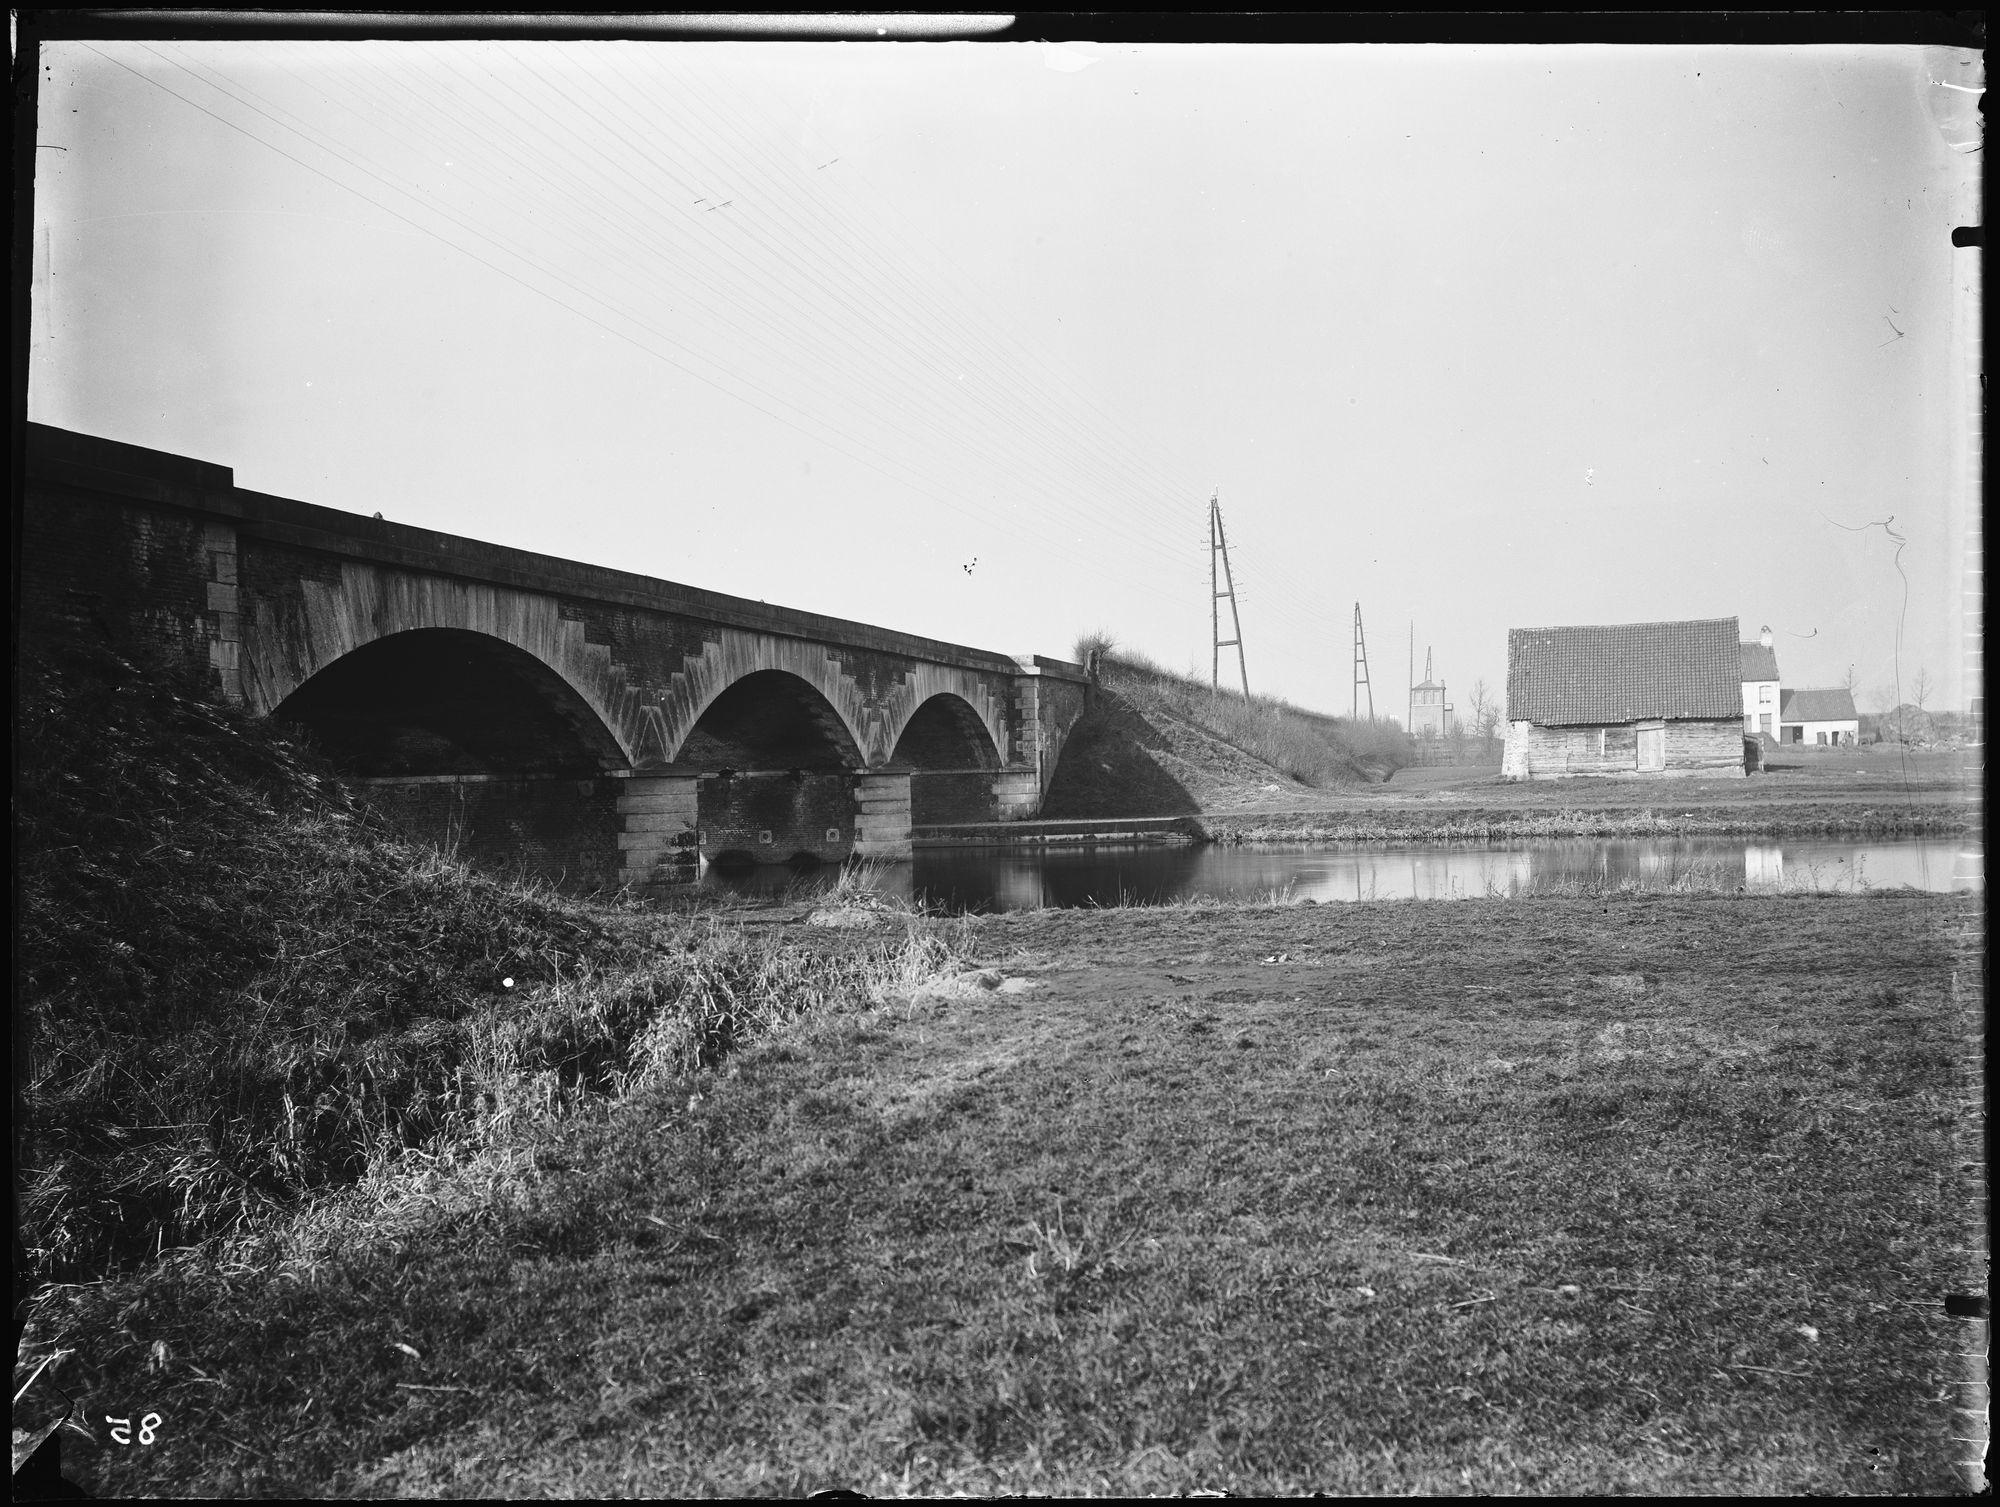 Spoorwegbrug over de Leie rond 1850